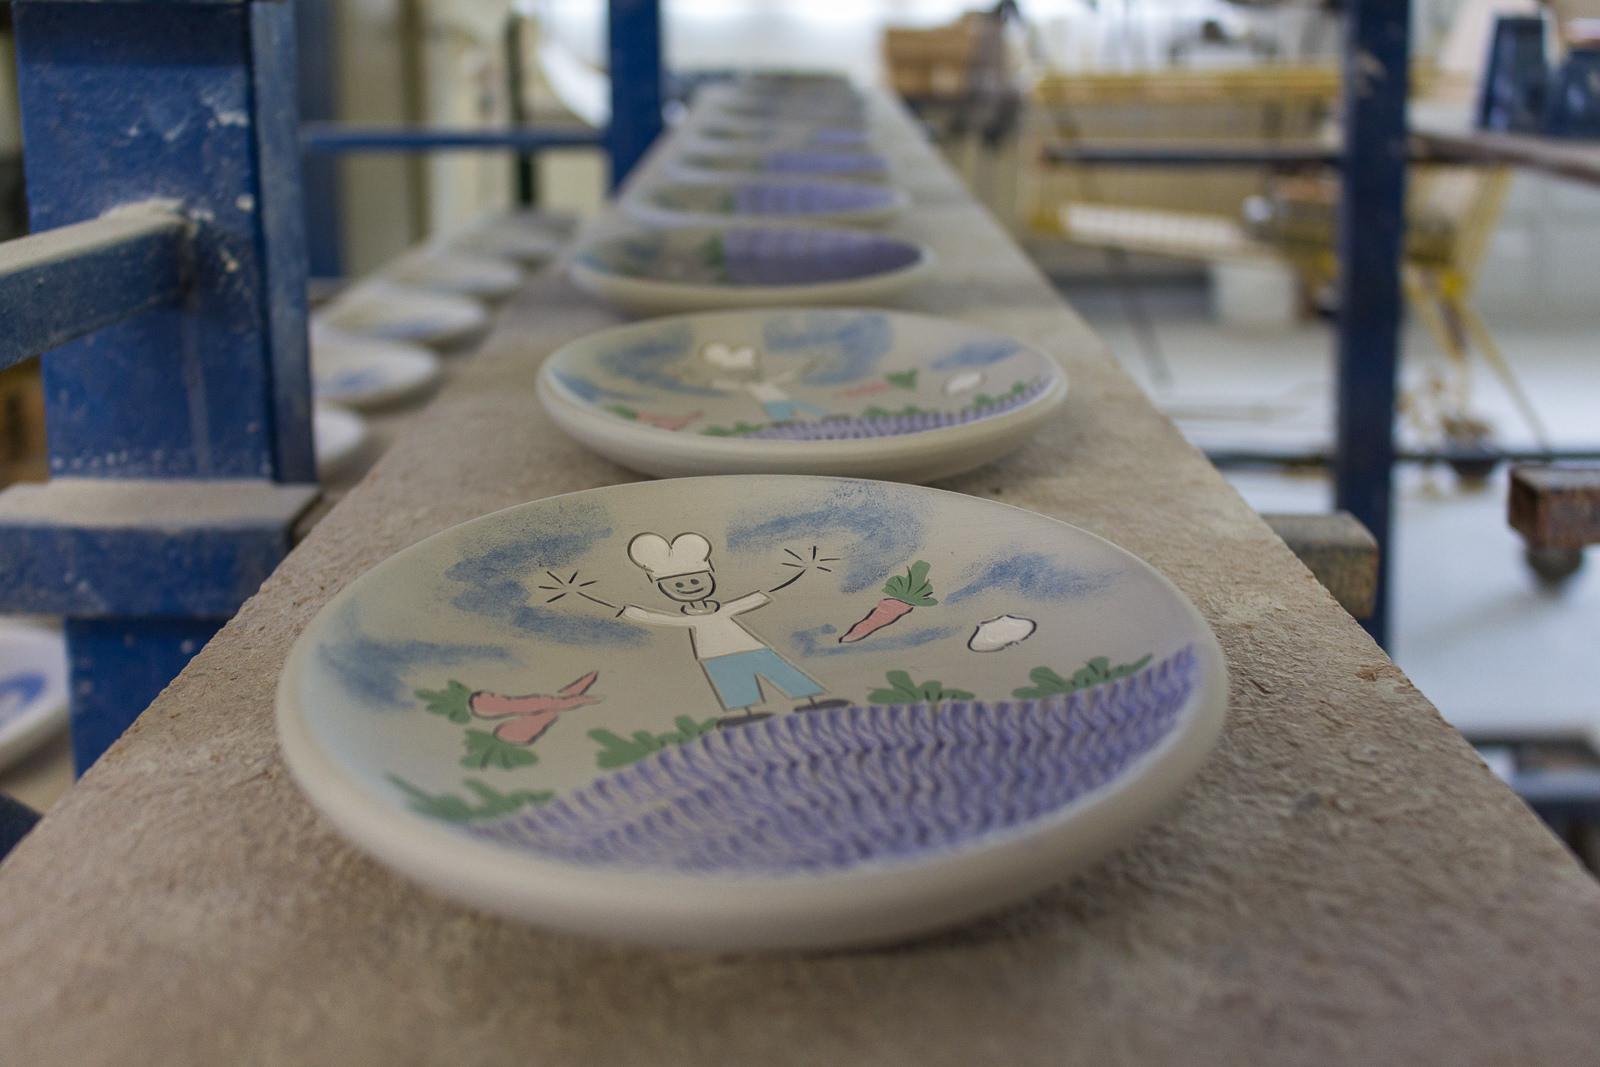 Girmscheid Töpferei,kannenbäckerland, #visitkeramik, Höhr-Grenzhausen, #RLPerleben, Ton, Keramik, Keramikkunst, Künstler, Manufaktur, Töpfern,